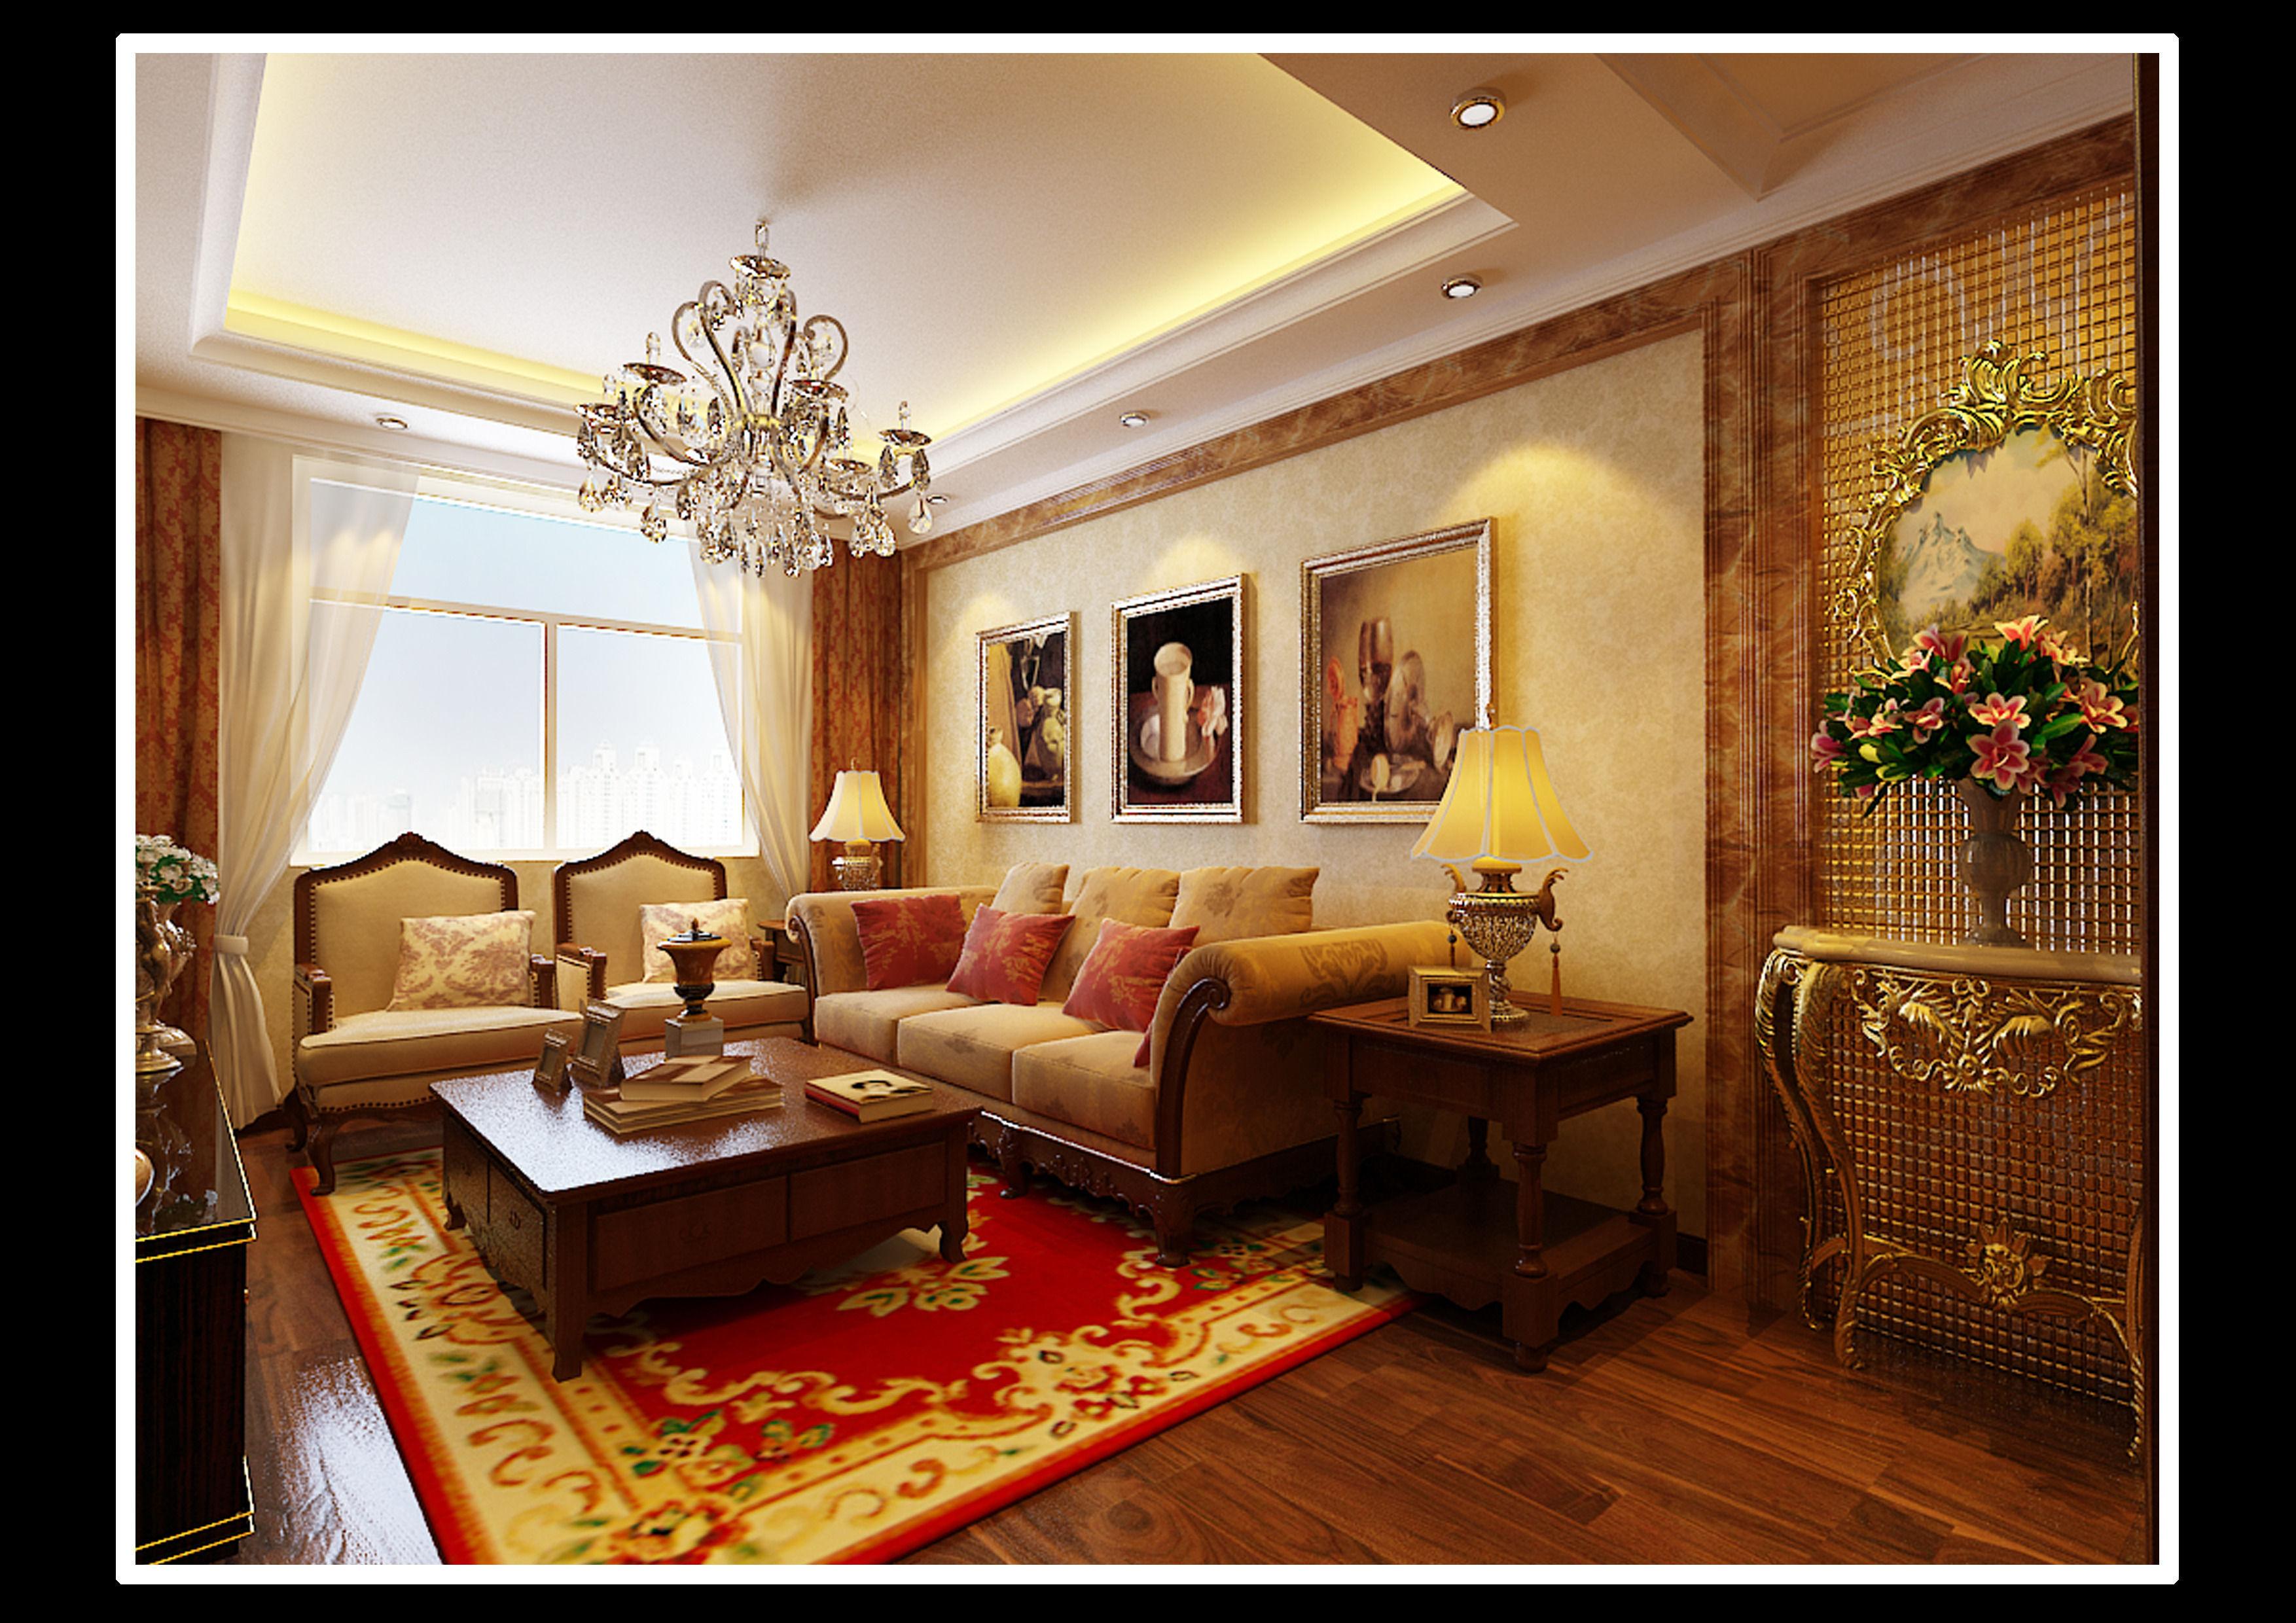 Realistic interior design 137 3d model max for Realistic living room ideas